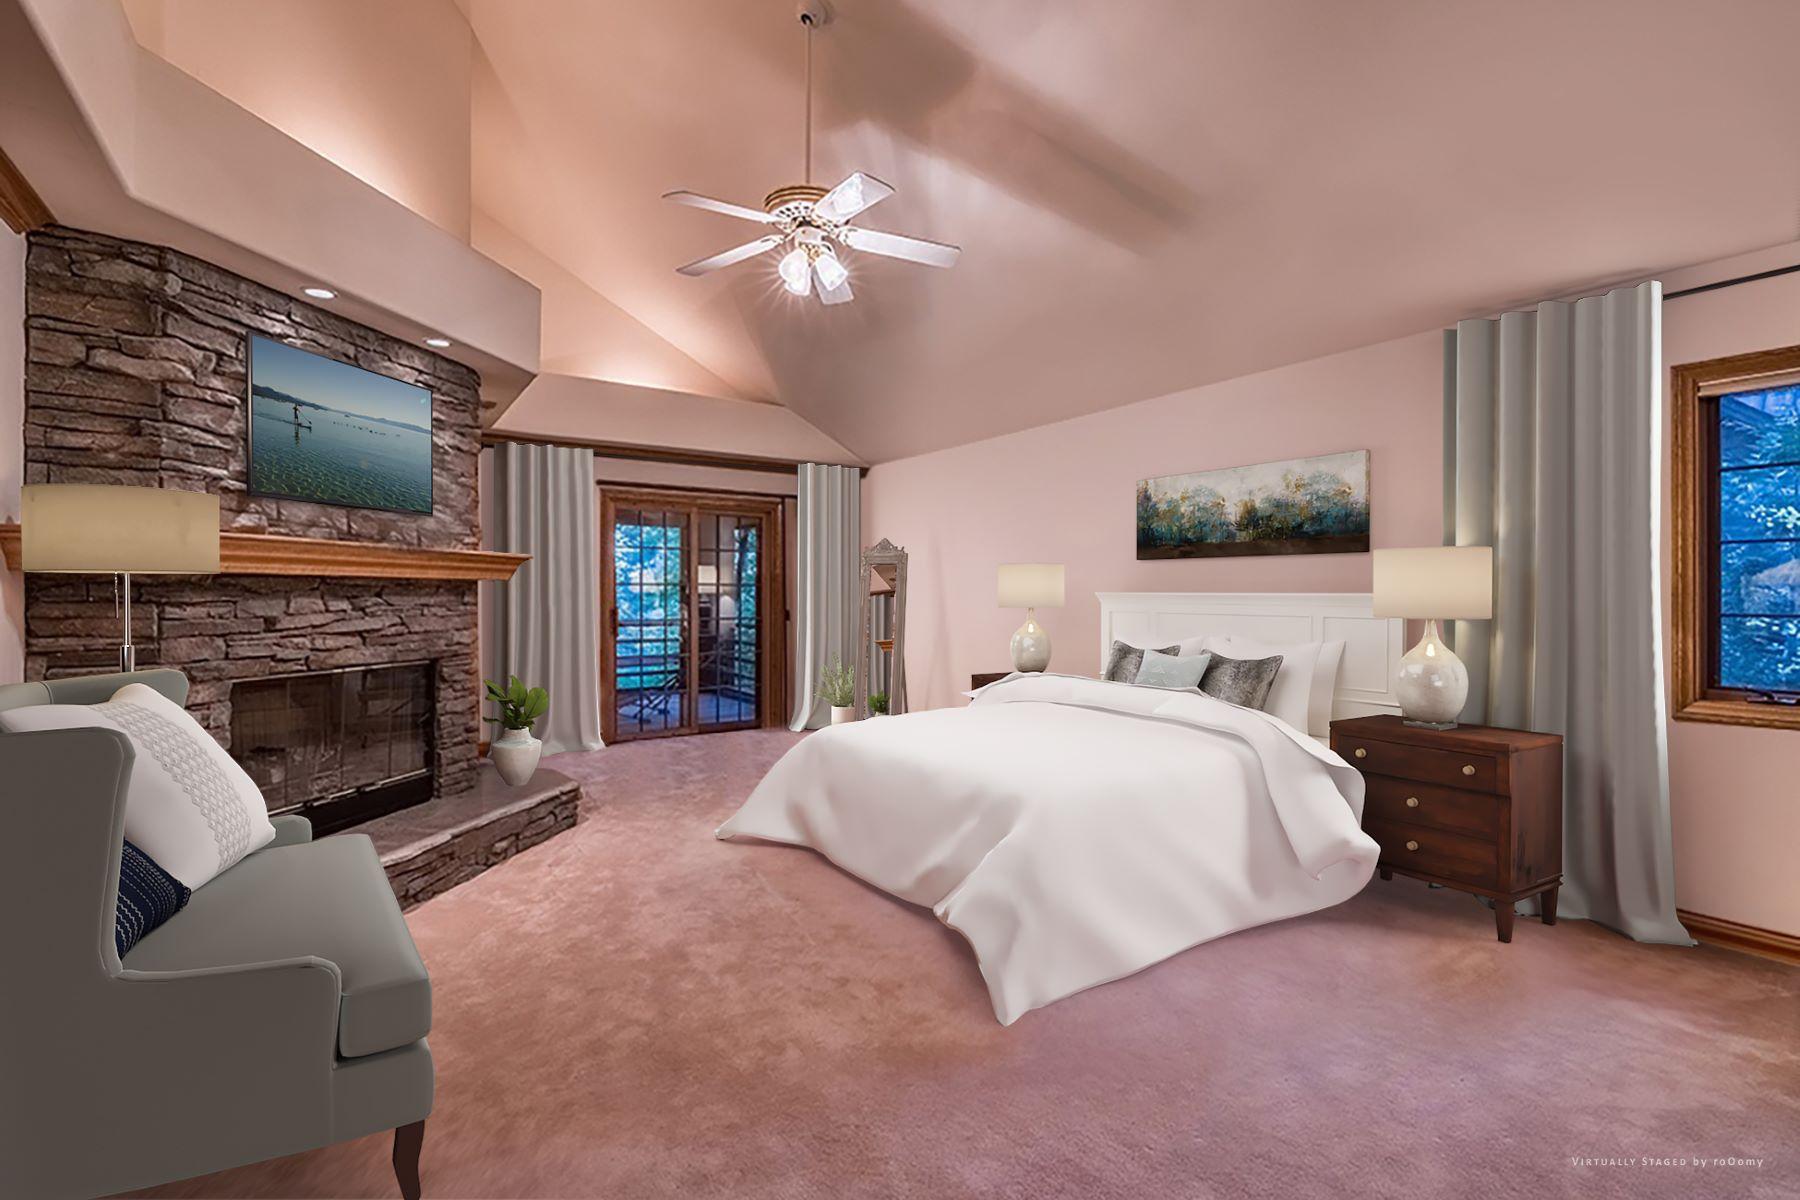 Additional photo for property listing at 761 Lakeshore Boulevard, Incline Village Nevada 761 Lakeshore Boulevard Incline Village, Nevada 89451 United States